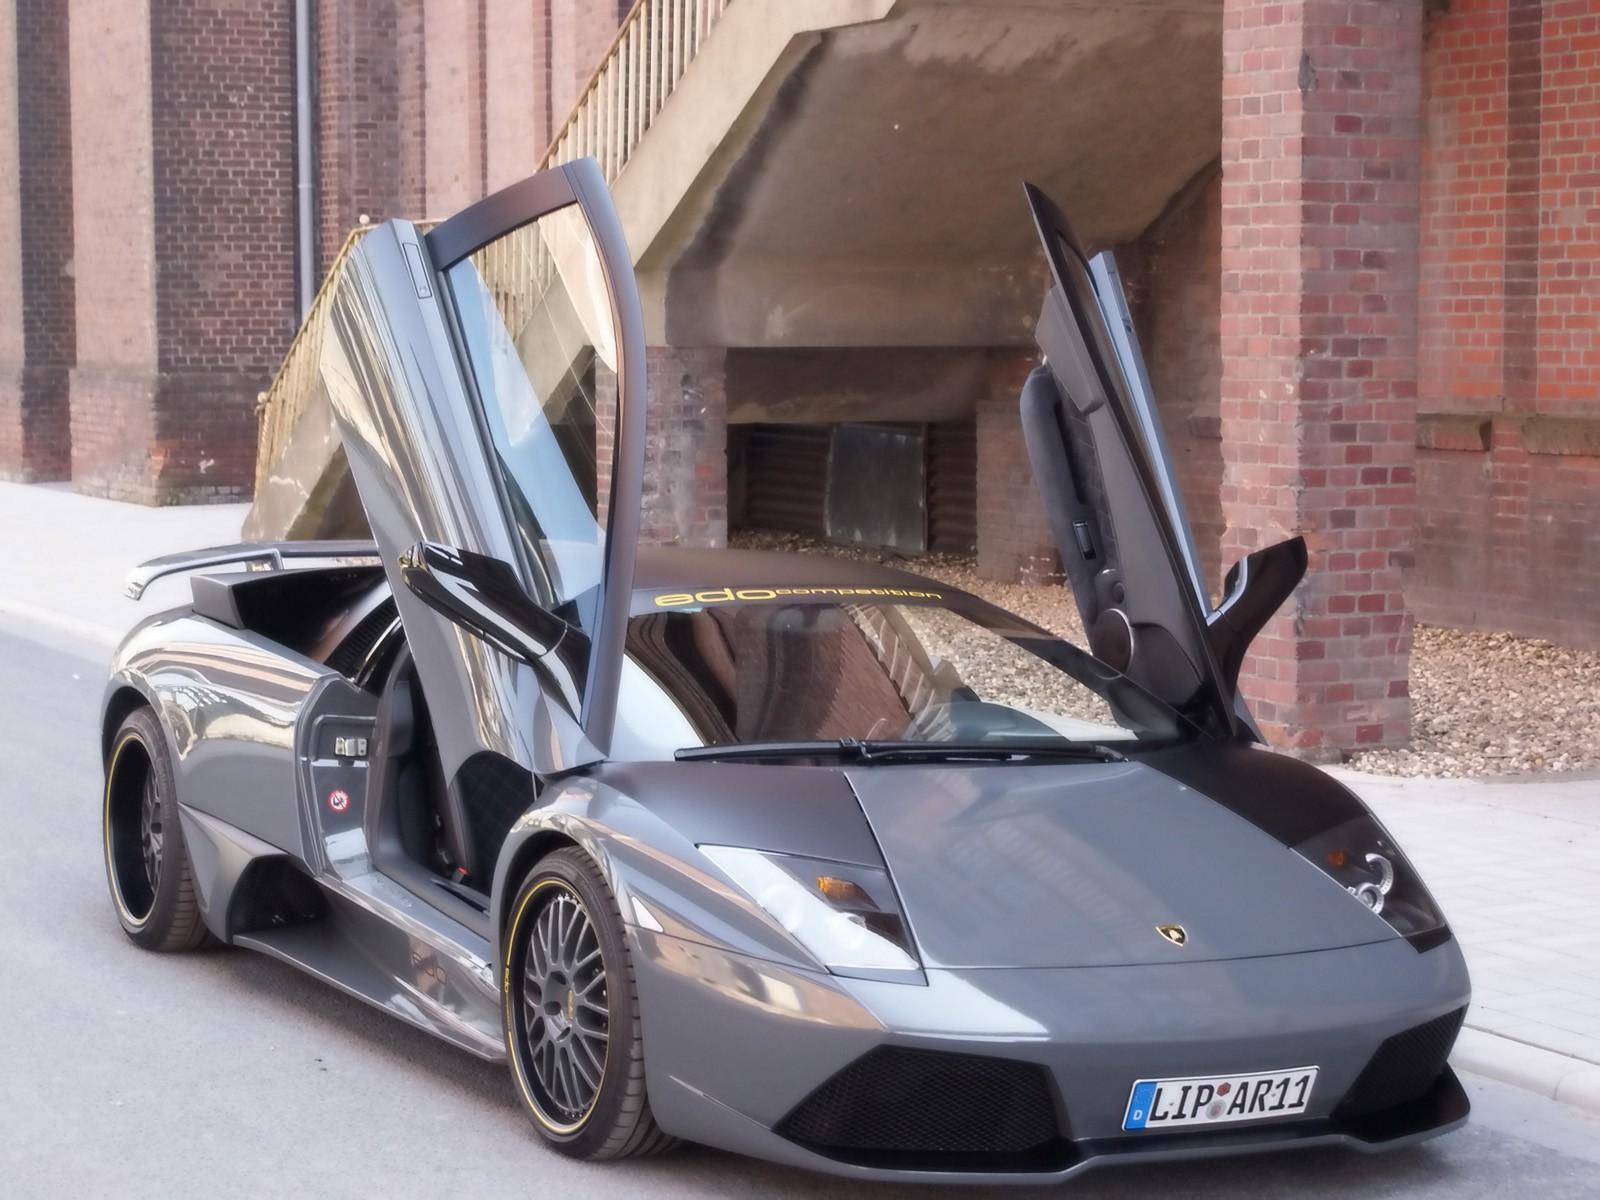 2008 Edo Competition Lamborghini lp710